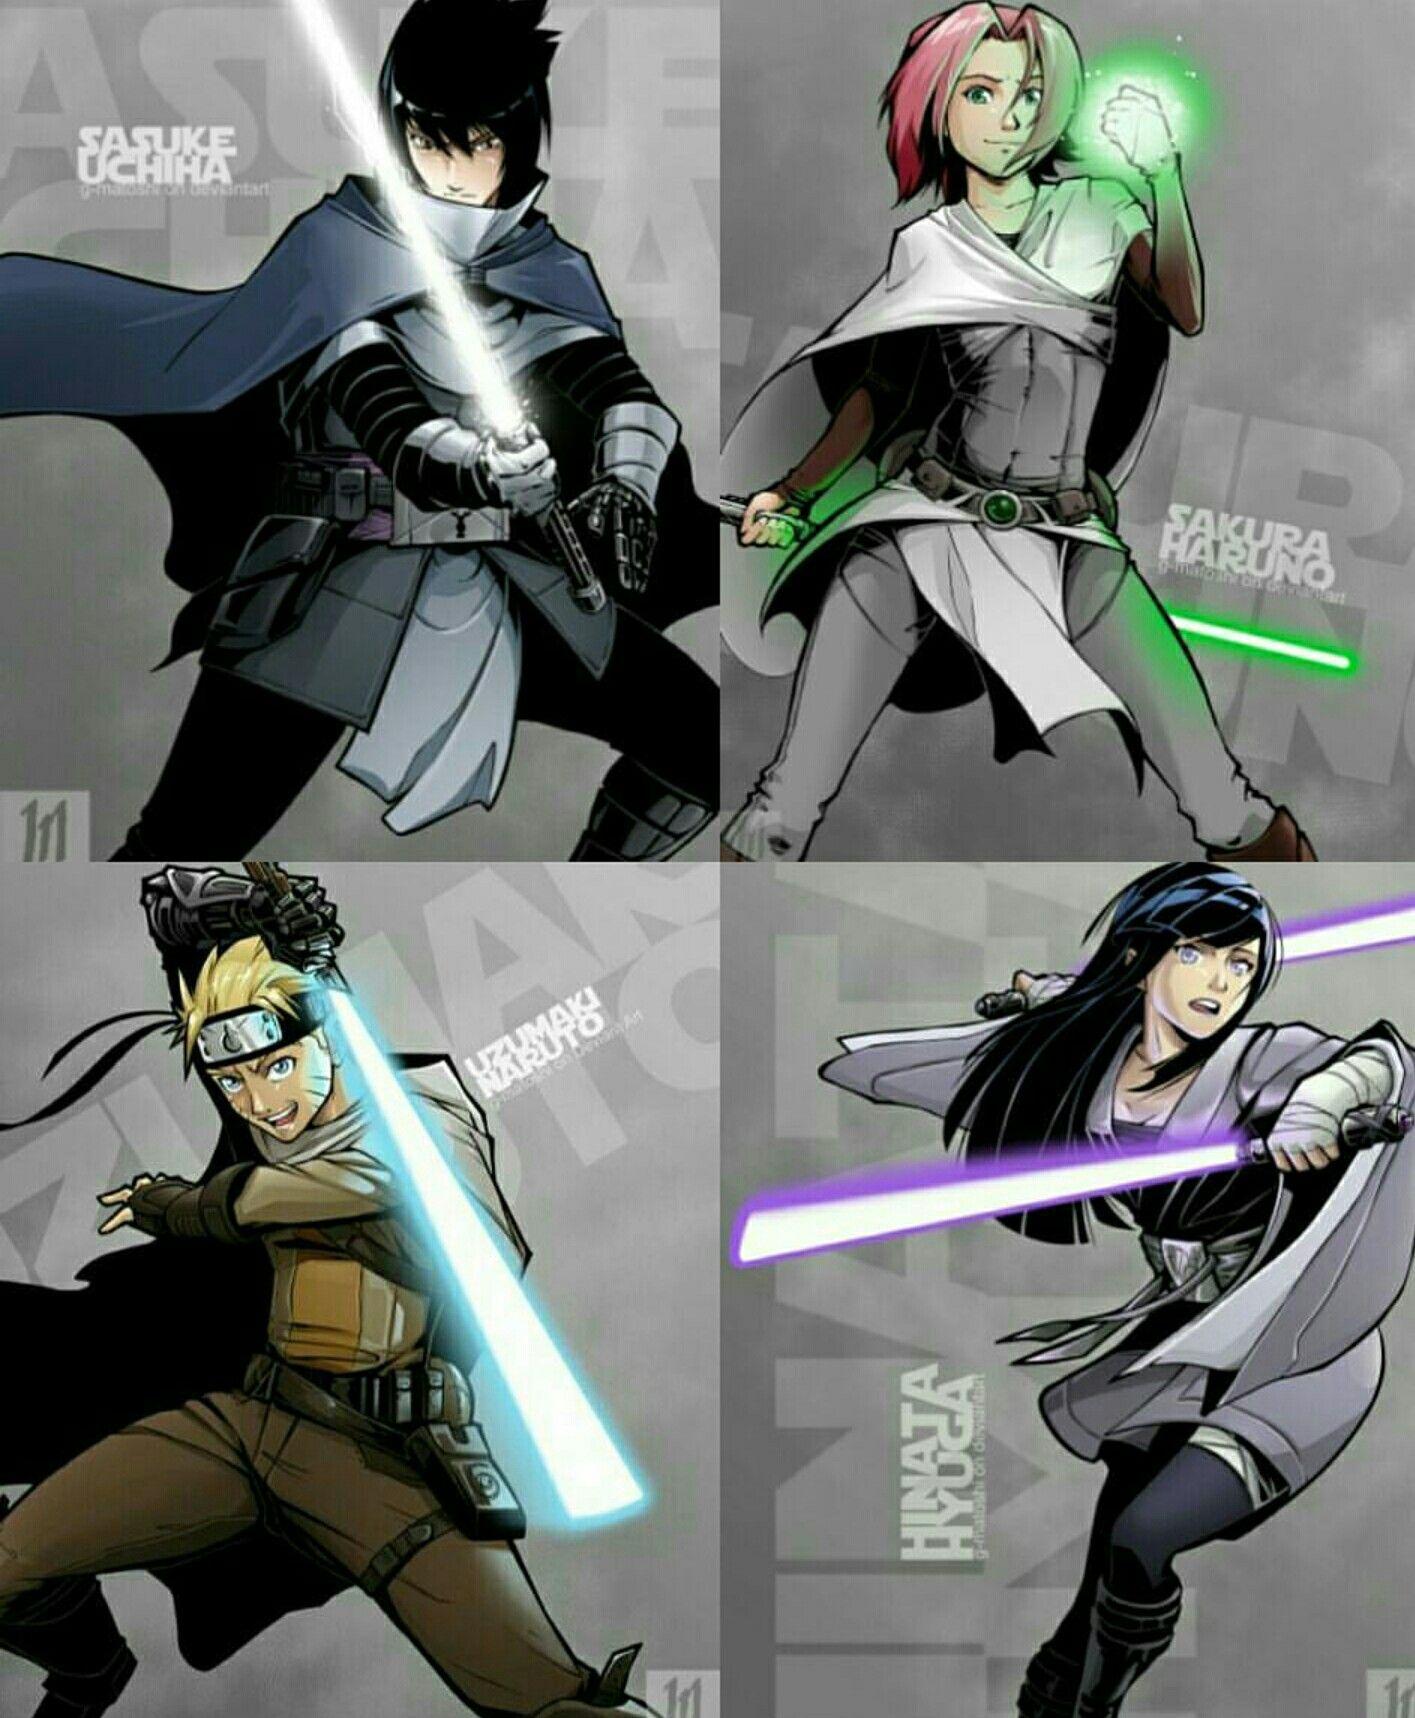 Starwars crossover  Anime stars, Star wars images, Darth vader